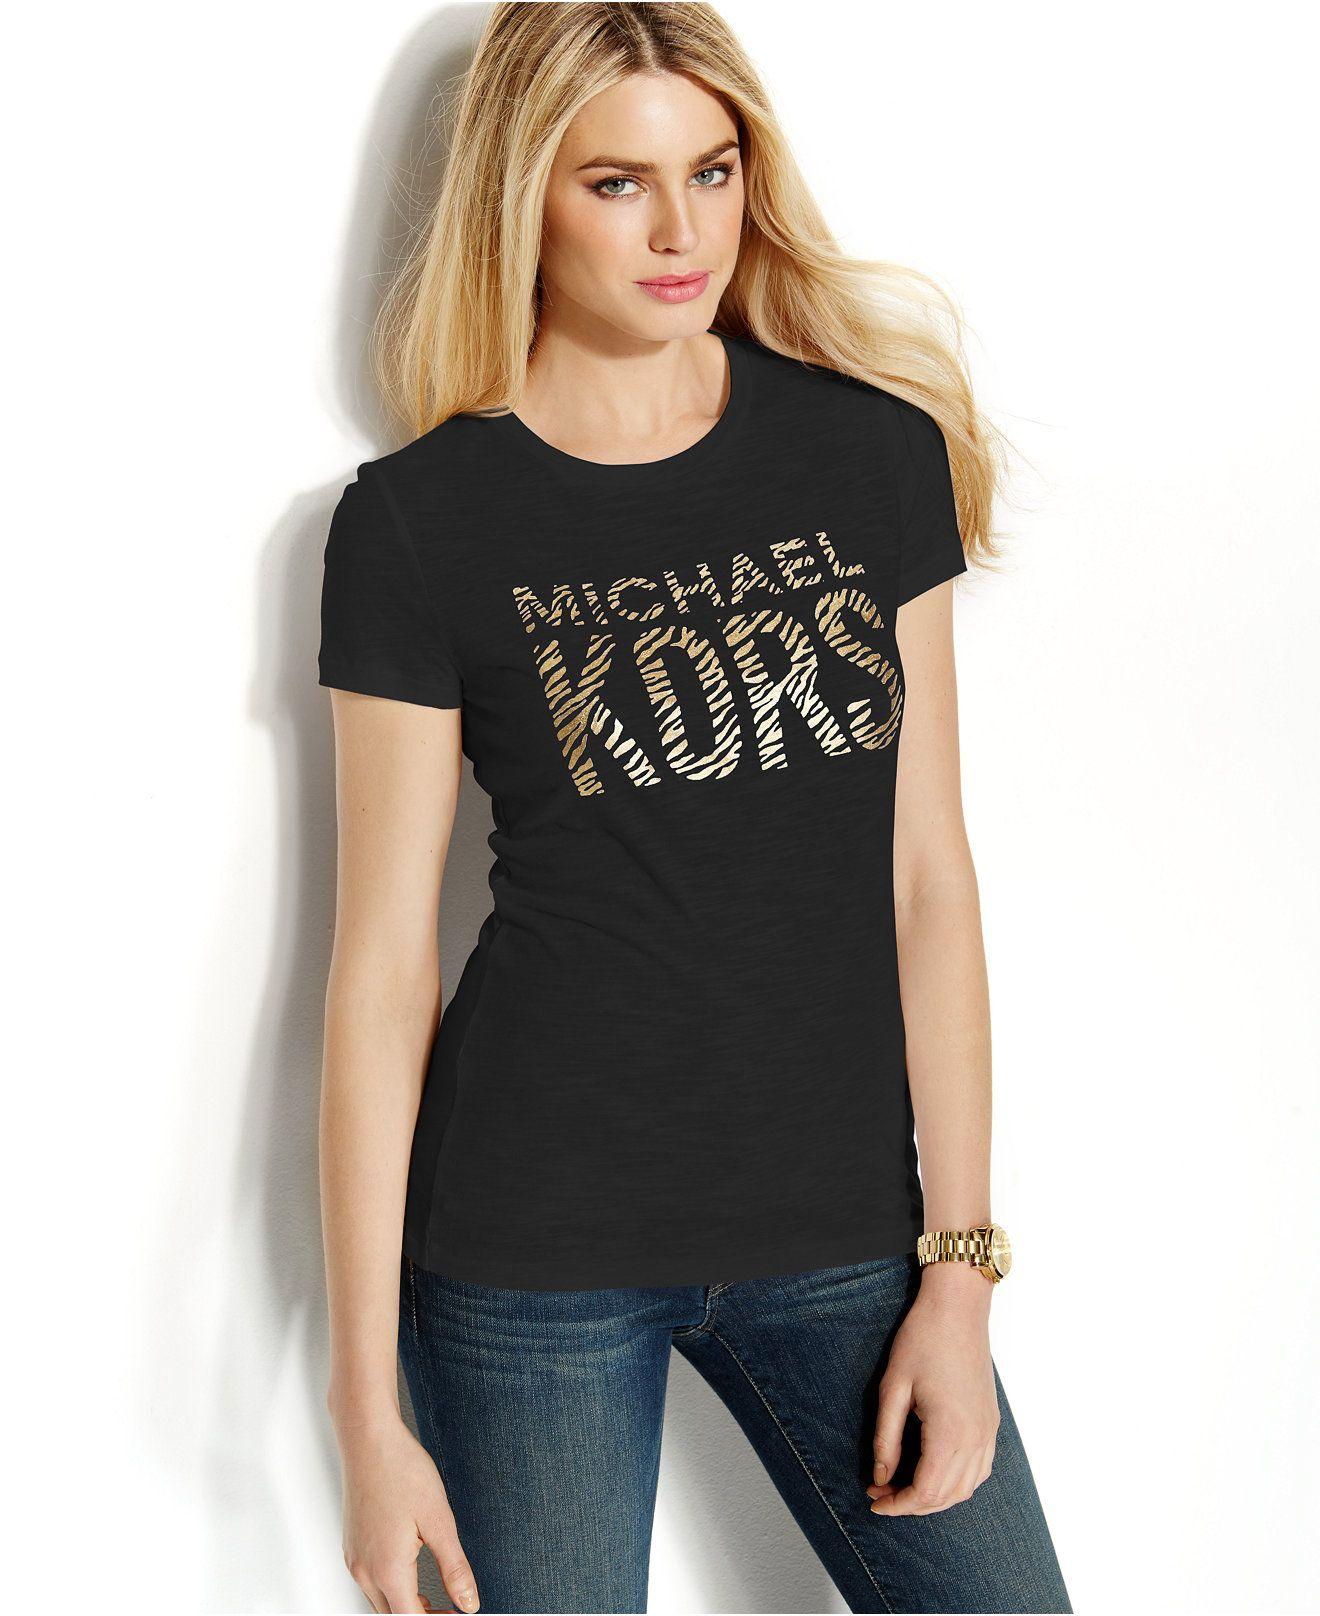 11ddecfb742 MICHAEL Michael Kors Metallic Animal-Print Logo Tee - Tops - Women - Macy's